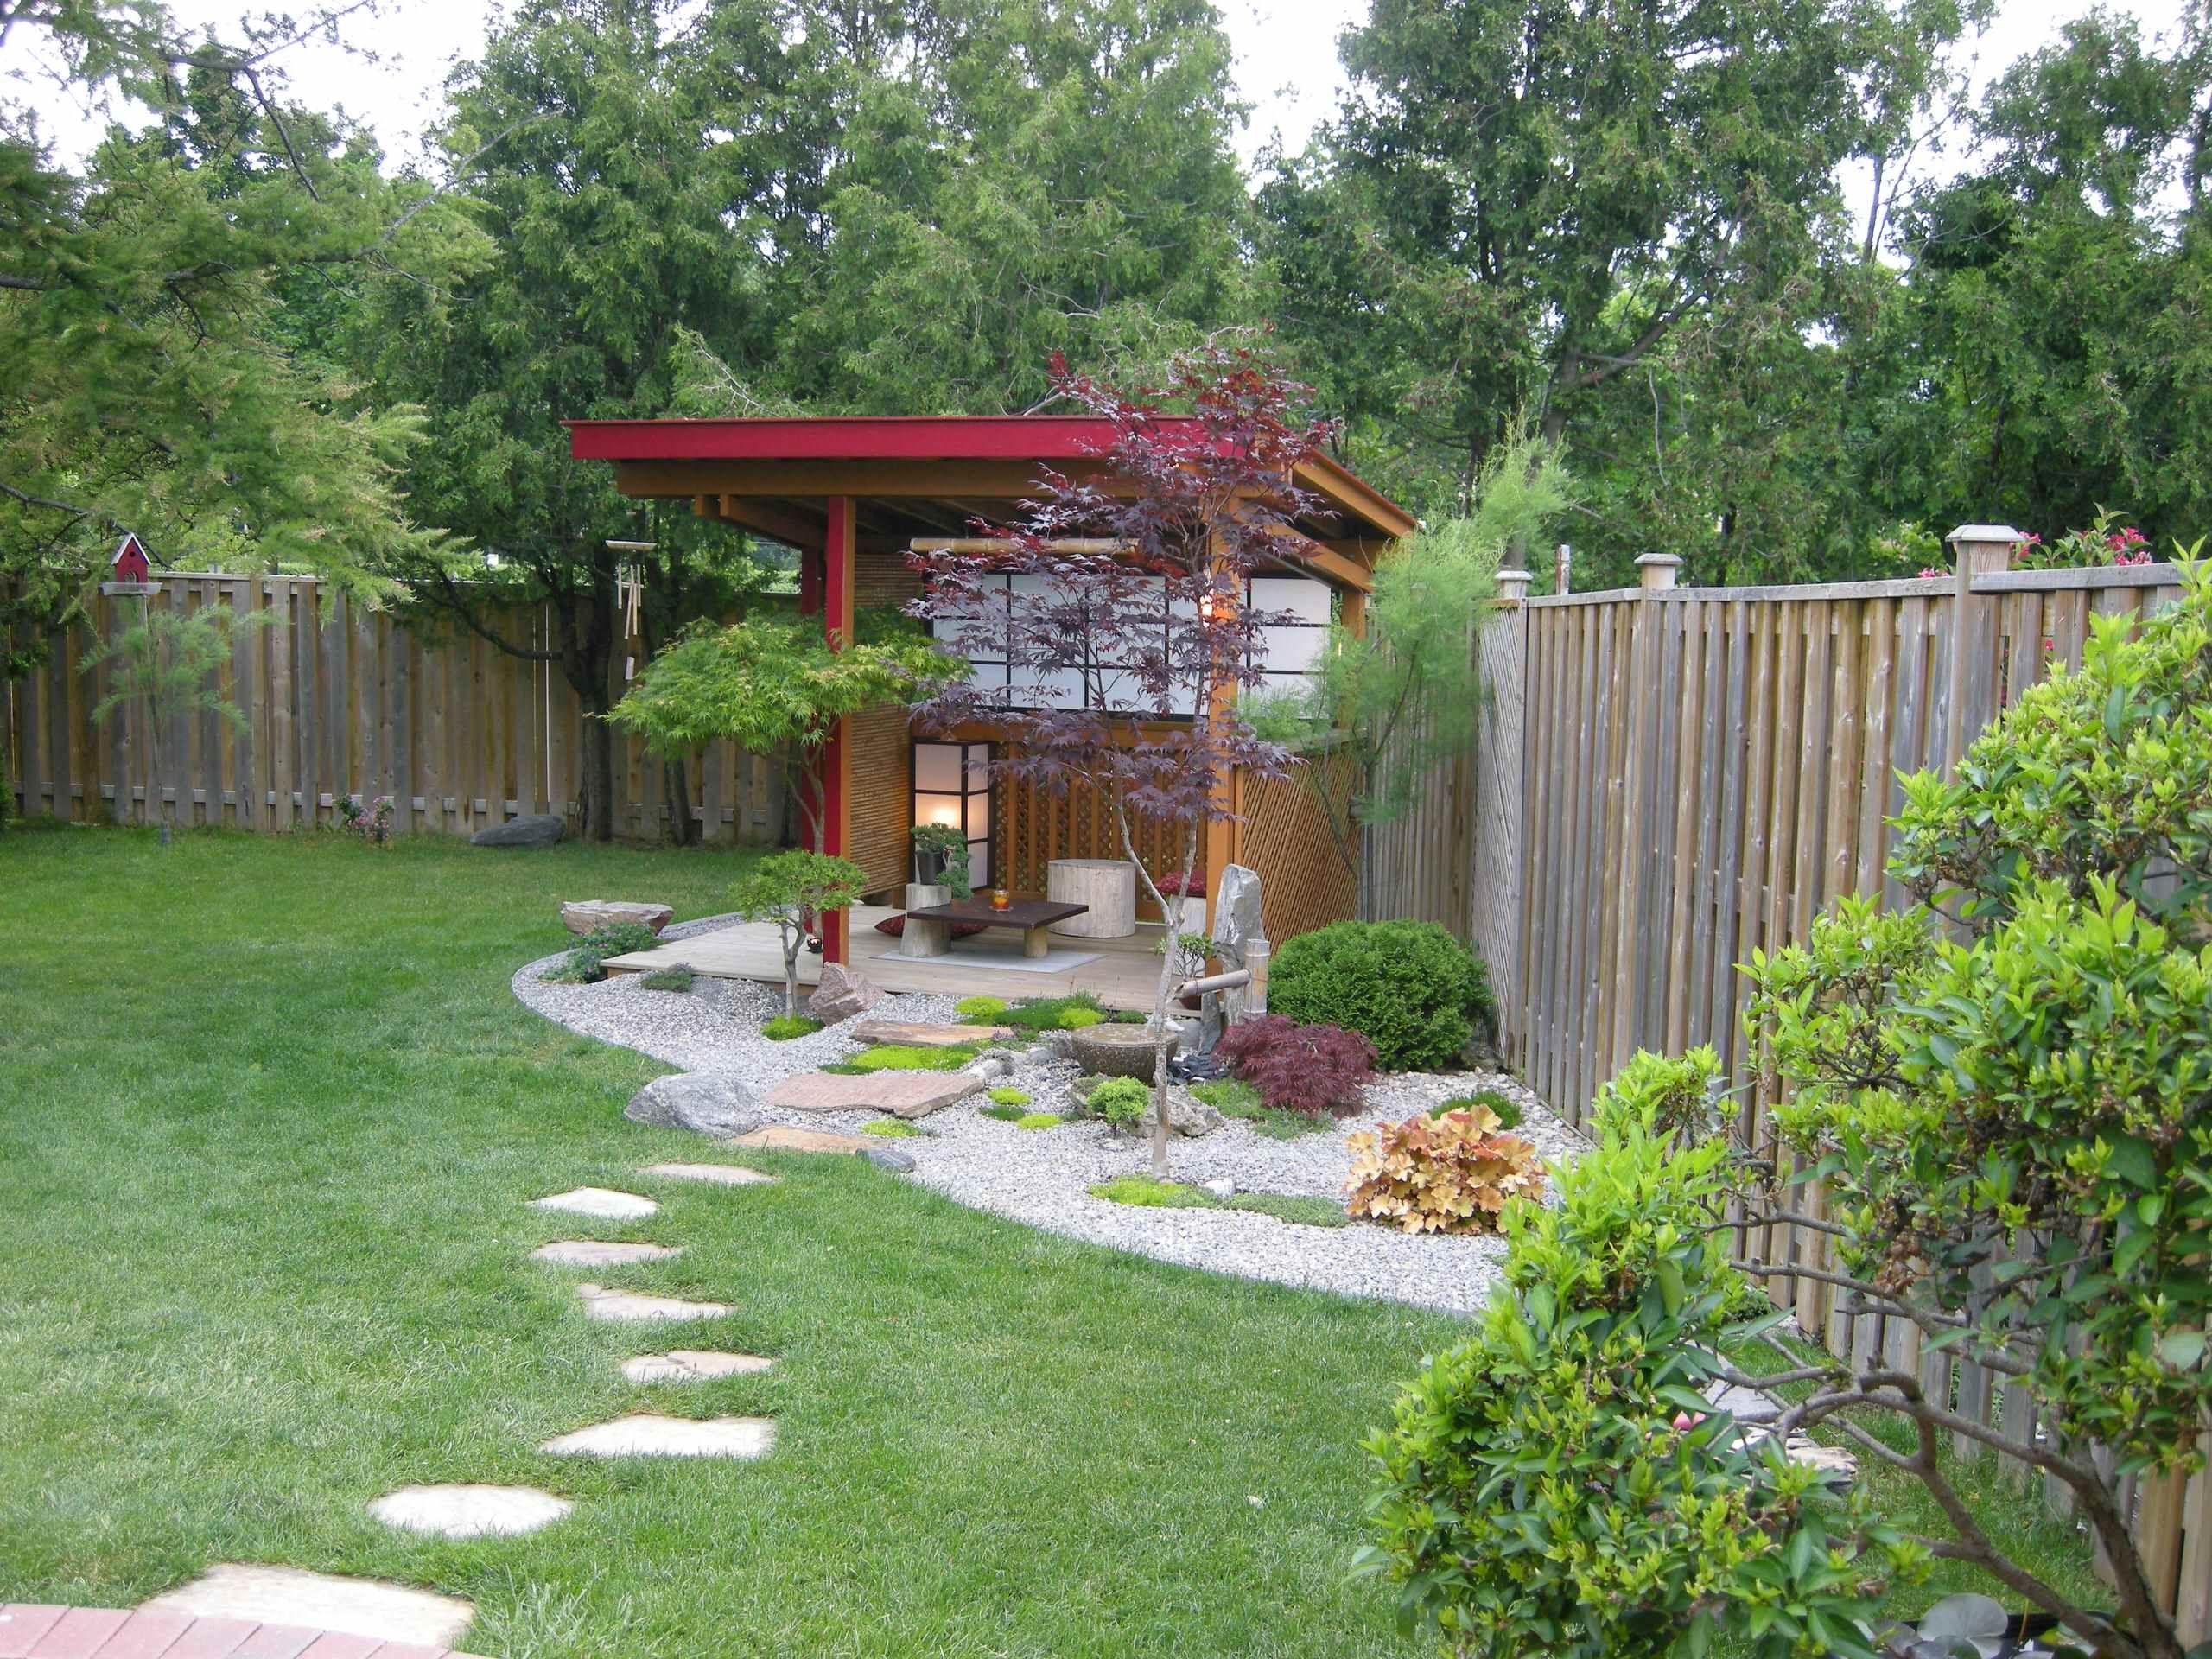 how to make a zen garden design in your backyard zen garden design in asian landscape with garden fences and how to make a zen garden in your backyard also - How To Make A Zen Garden